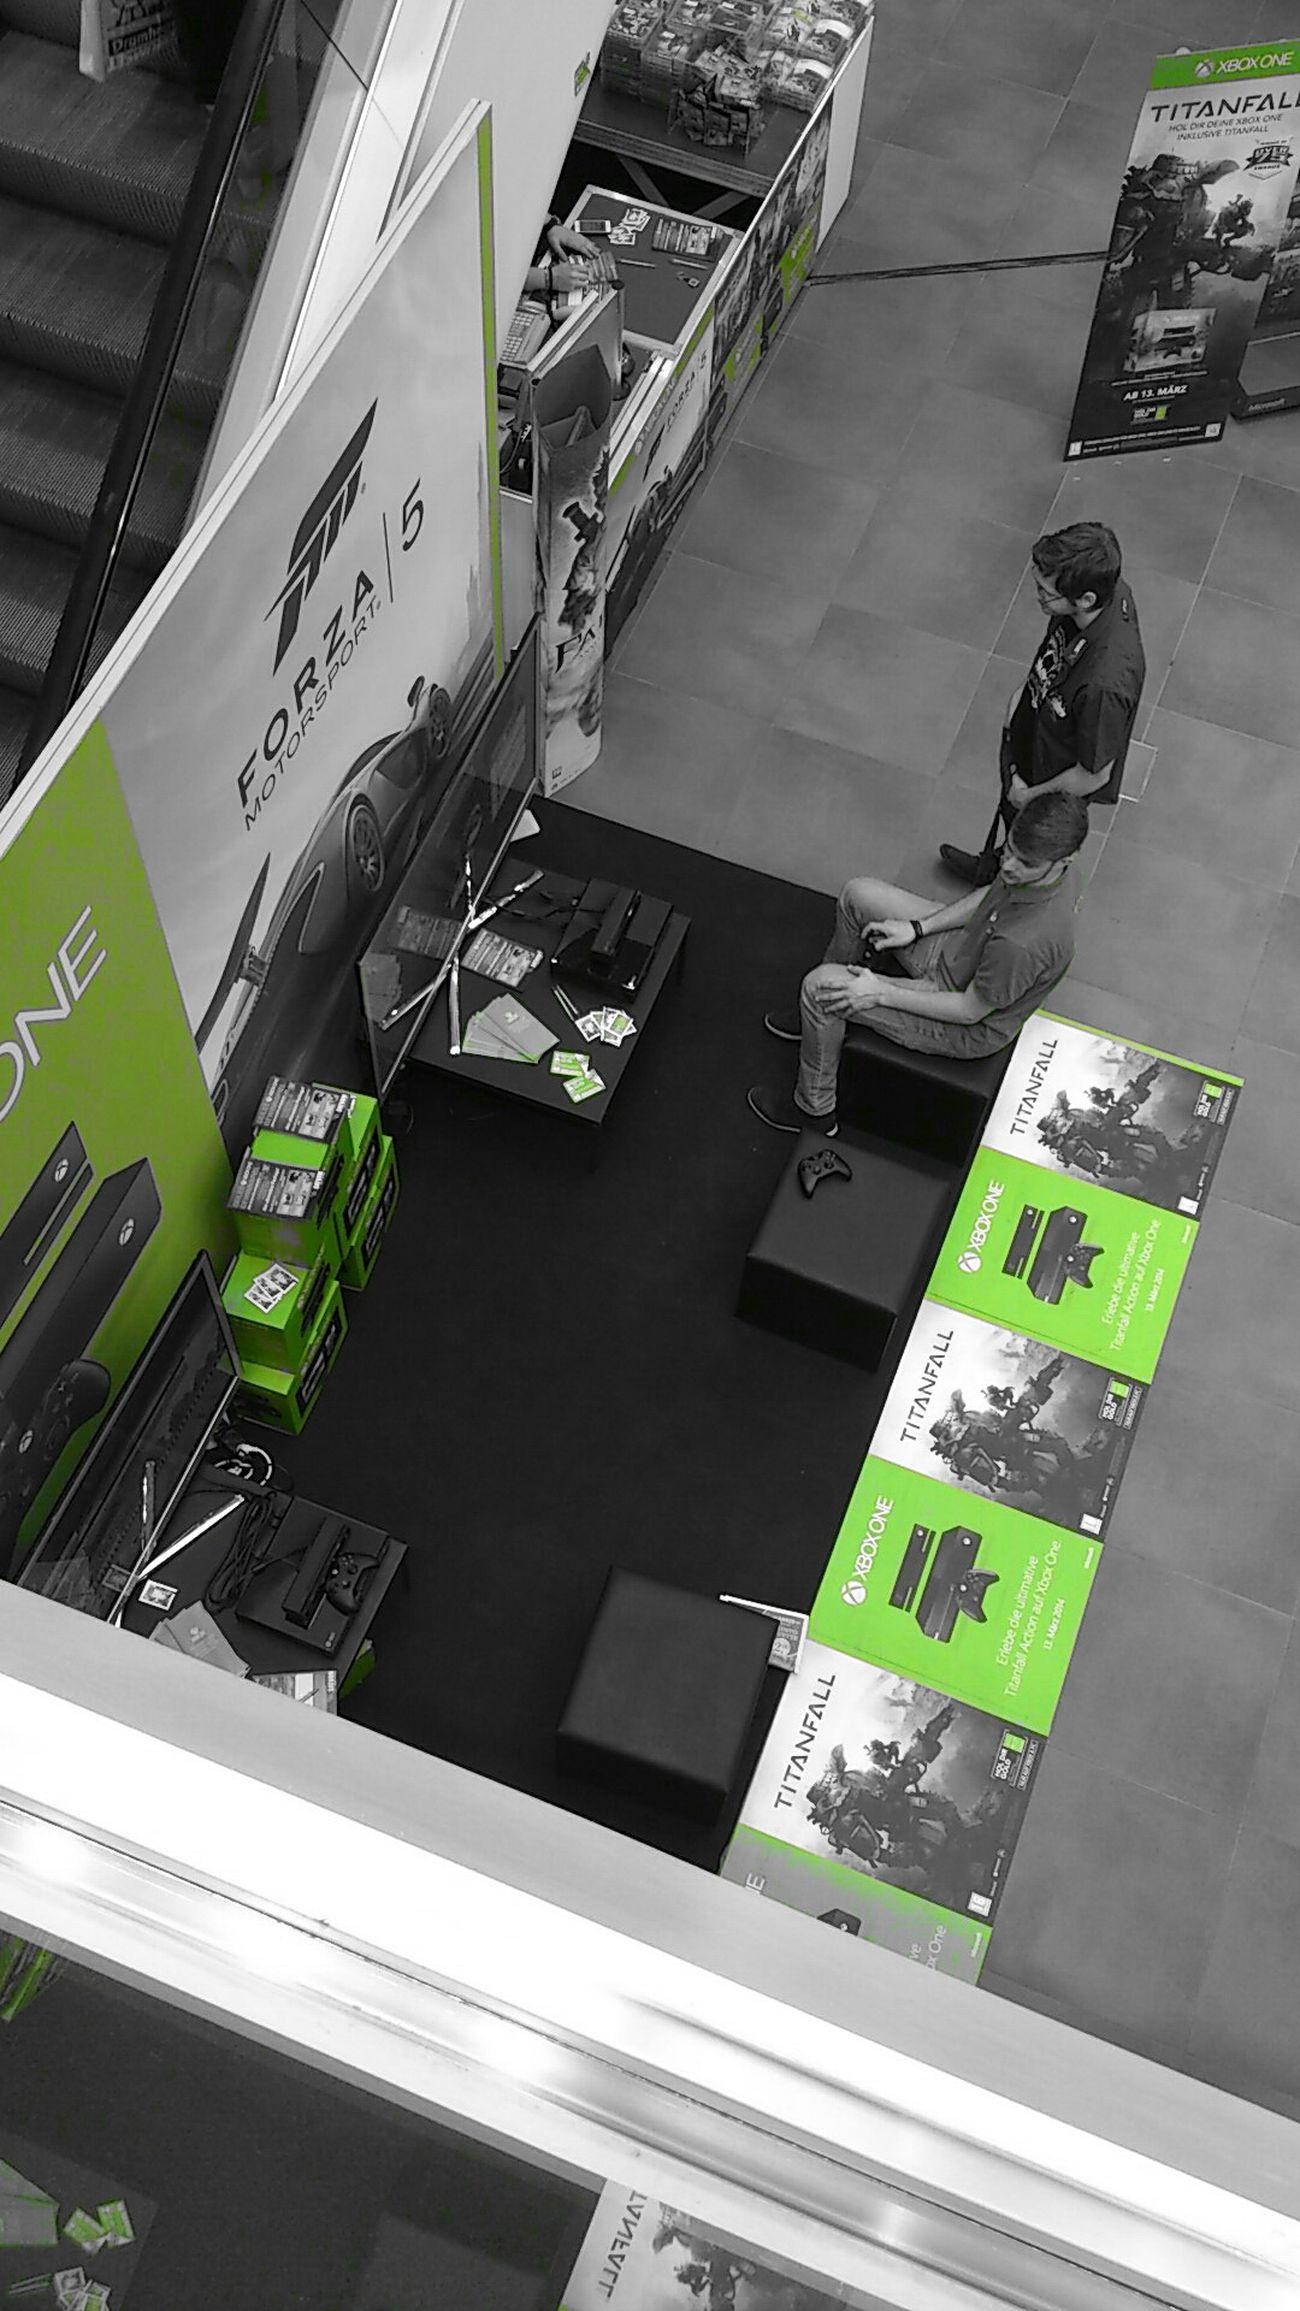 Xbox One Shoppingcenter Teilweise Farbig März 2014